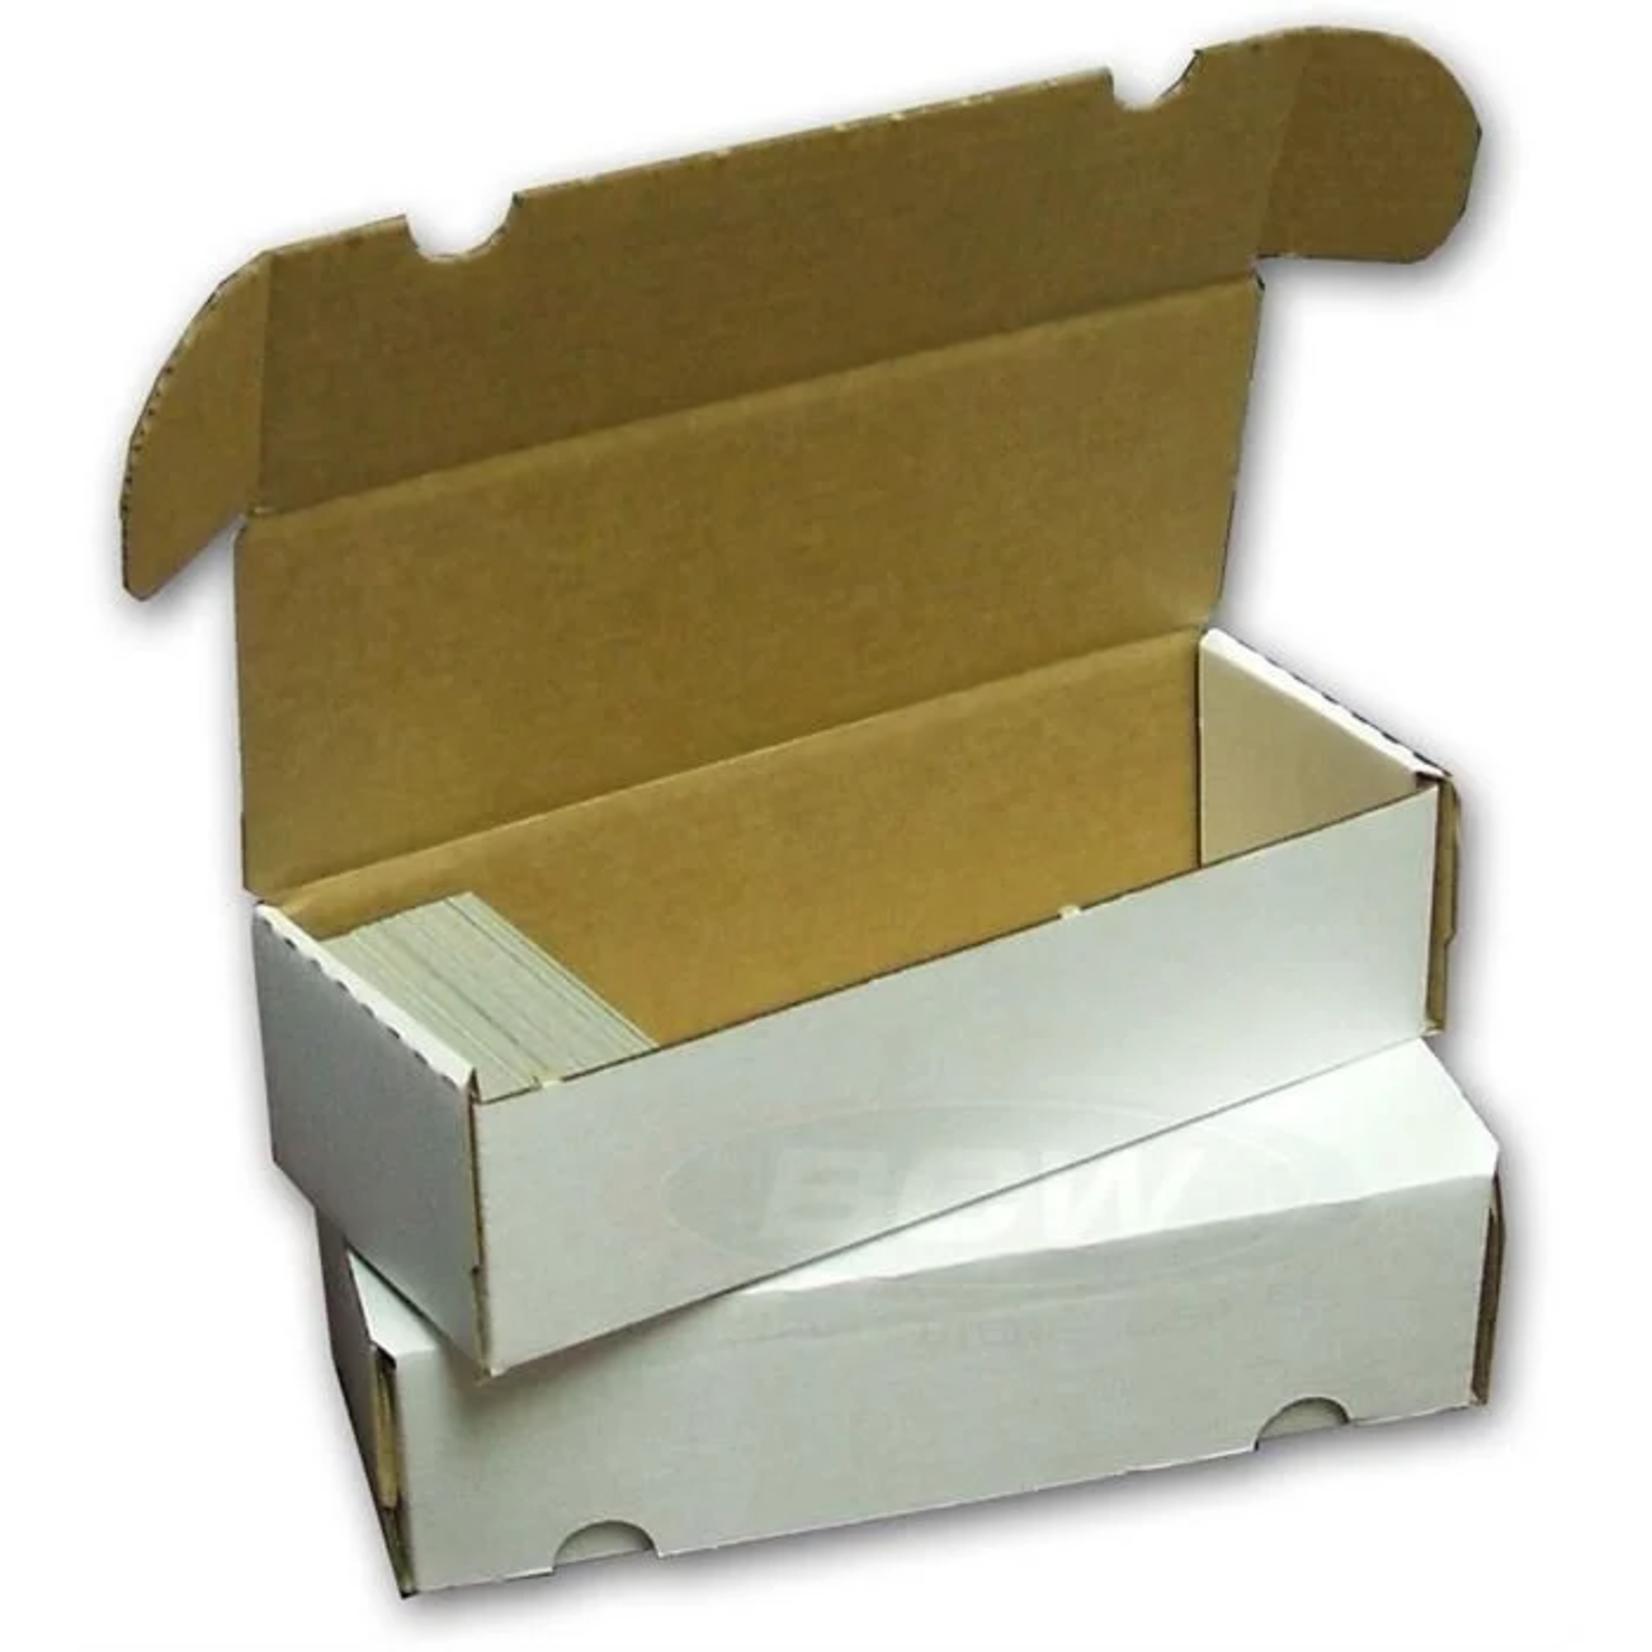 BCW Cardboard Box 550 Ct